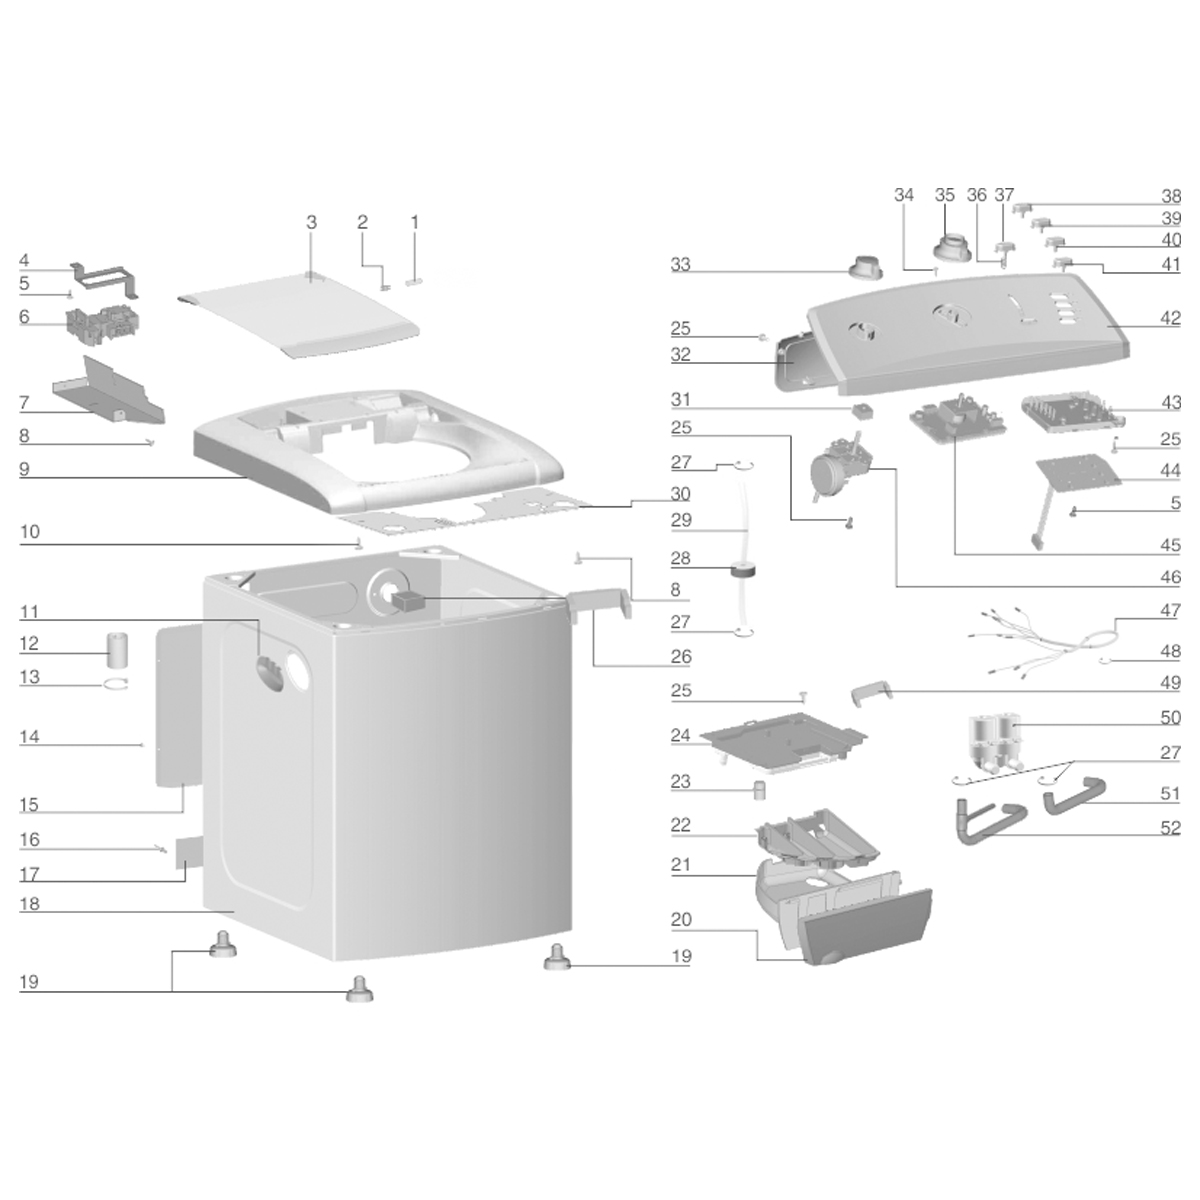 Placa De Potência Para Lavadora De Roupas Top Load 12kg Electrolux LT12B - A99035101